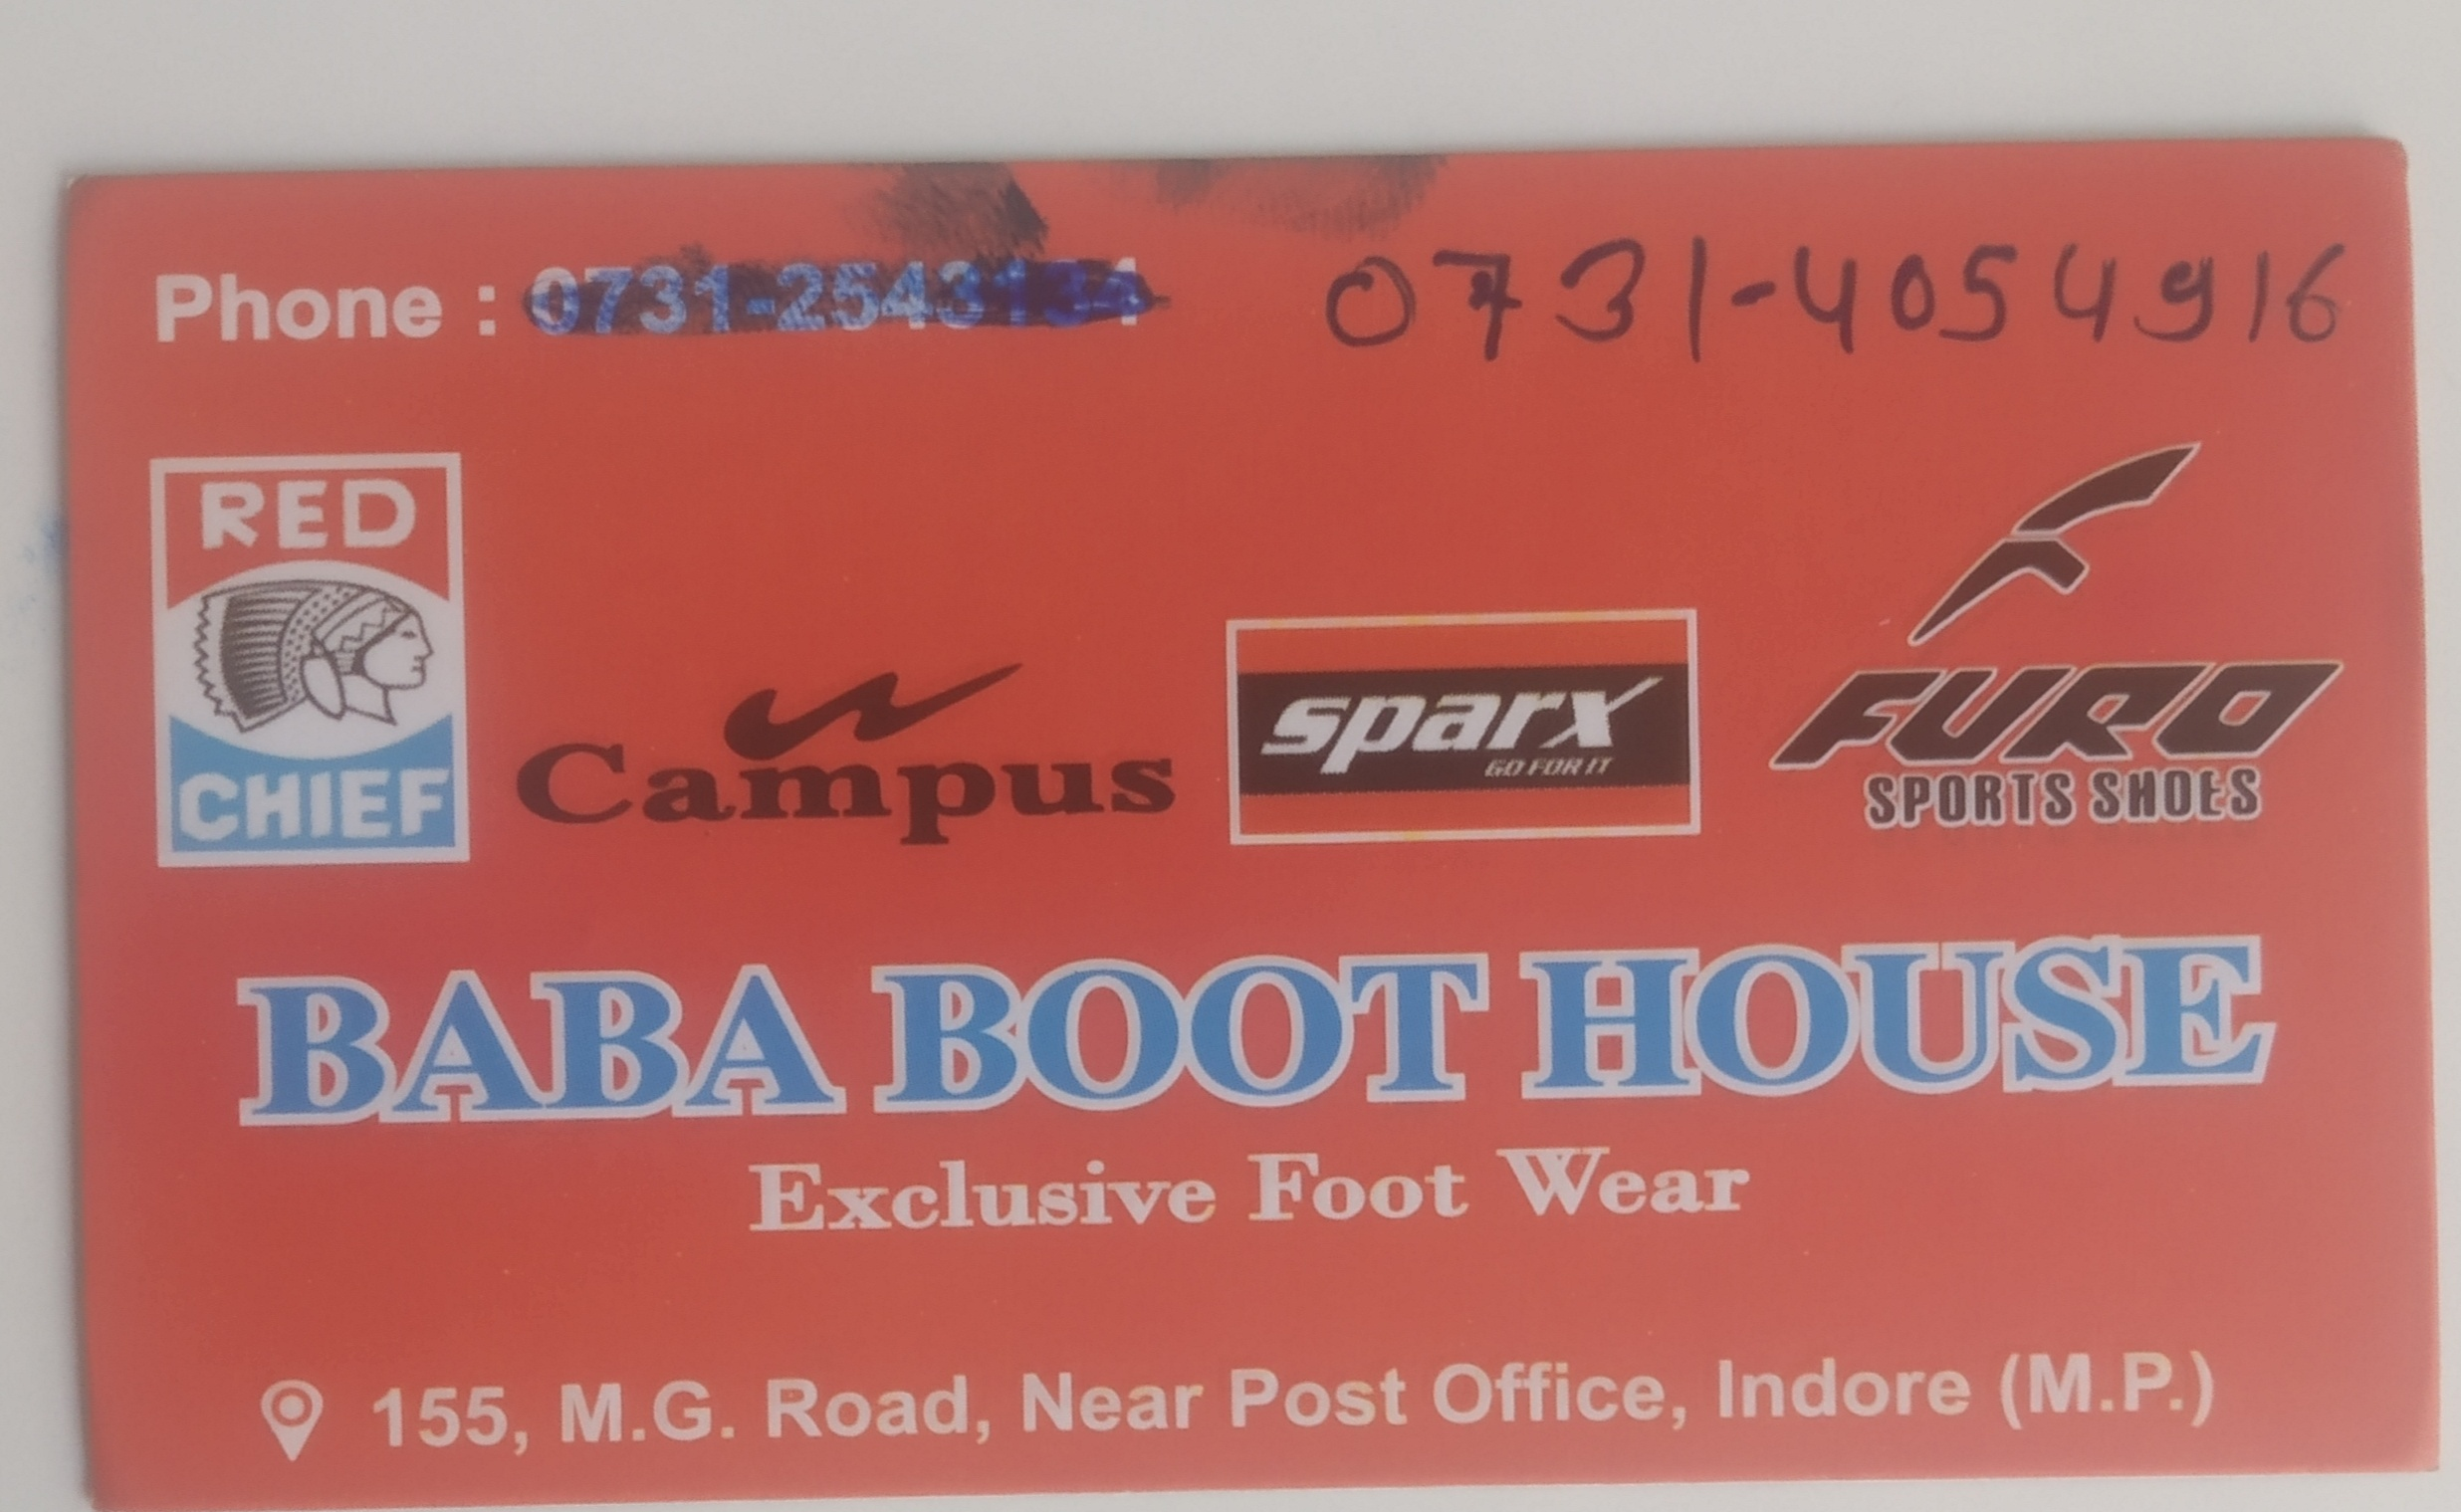 Baba boot house